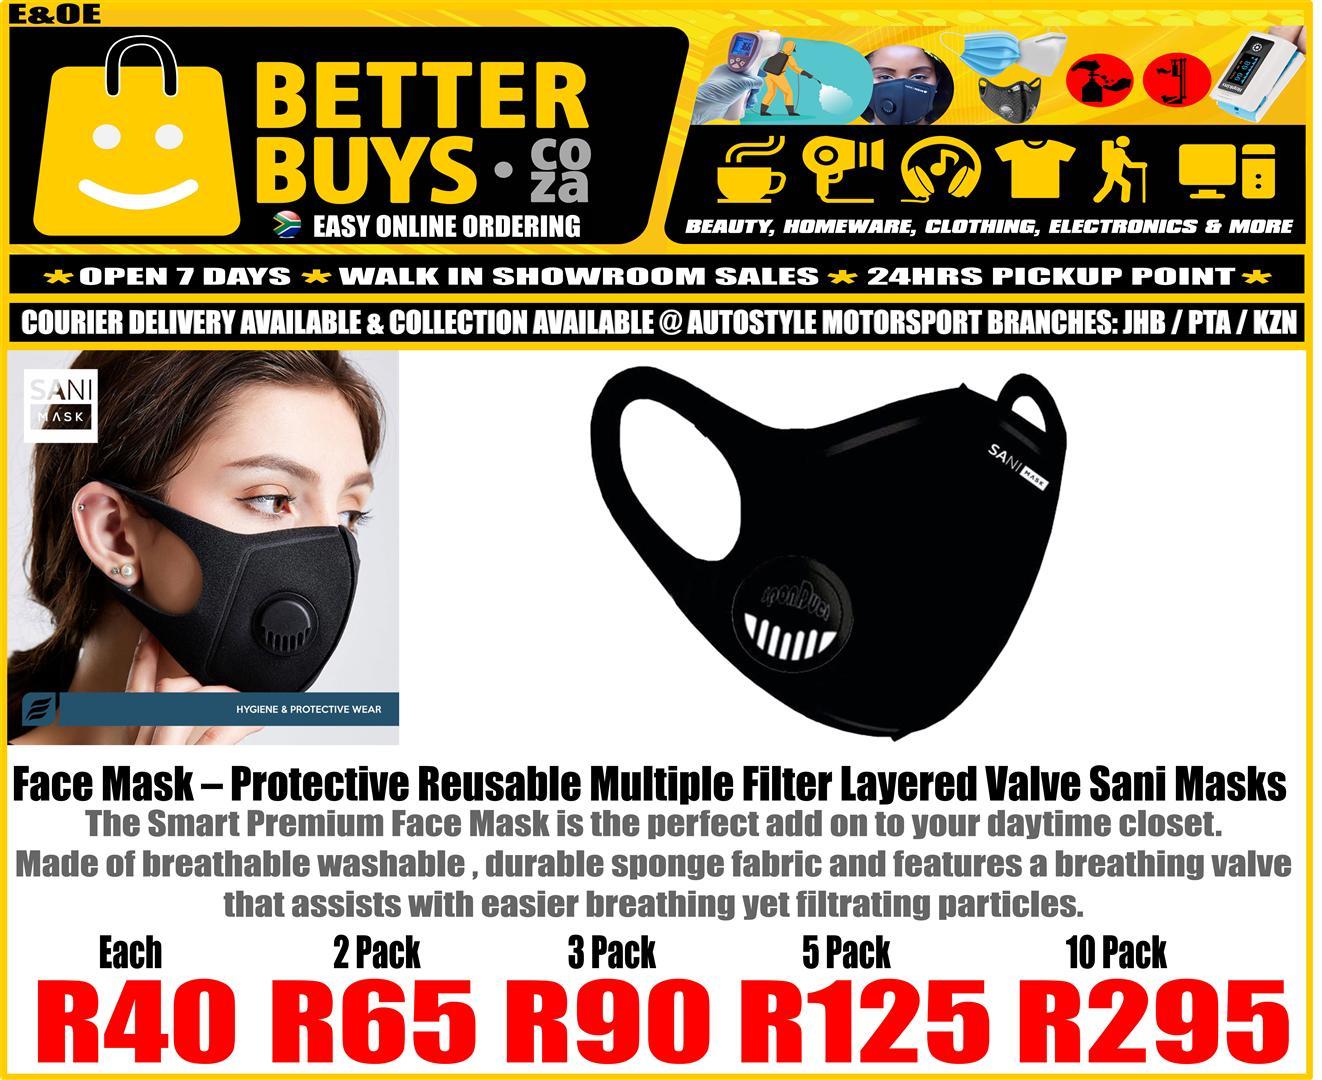 Face Mask – Protective Reusable Multiple Filter Layered Valve Sani Masks  Each -